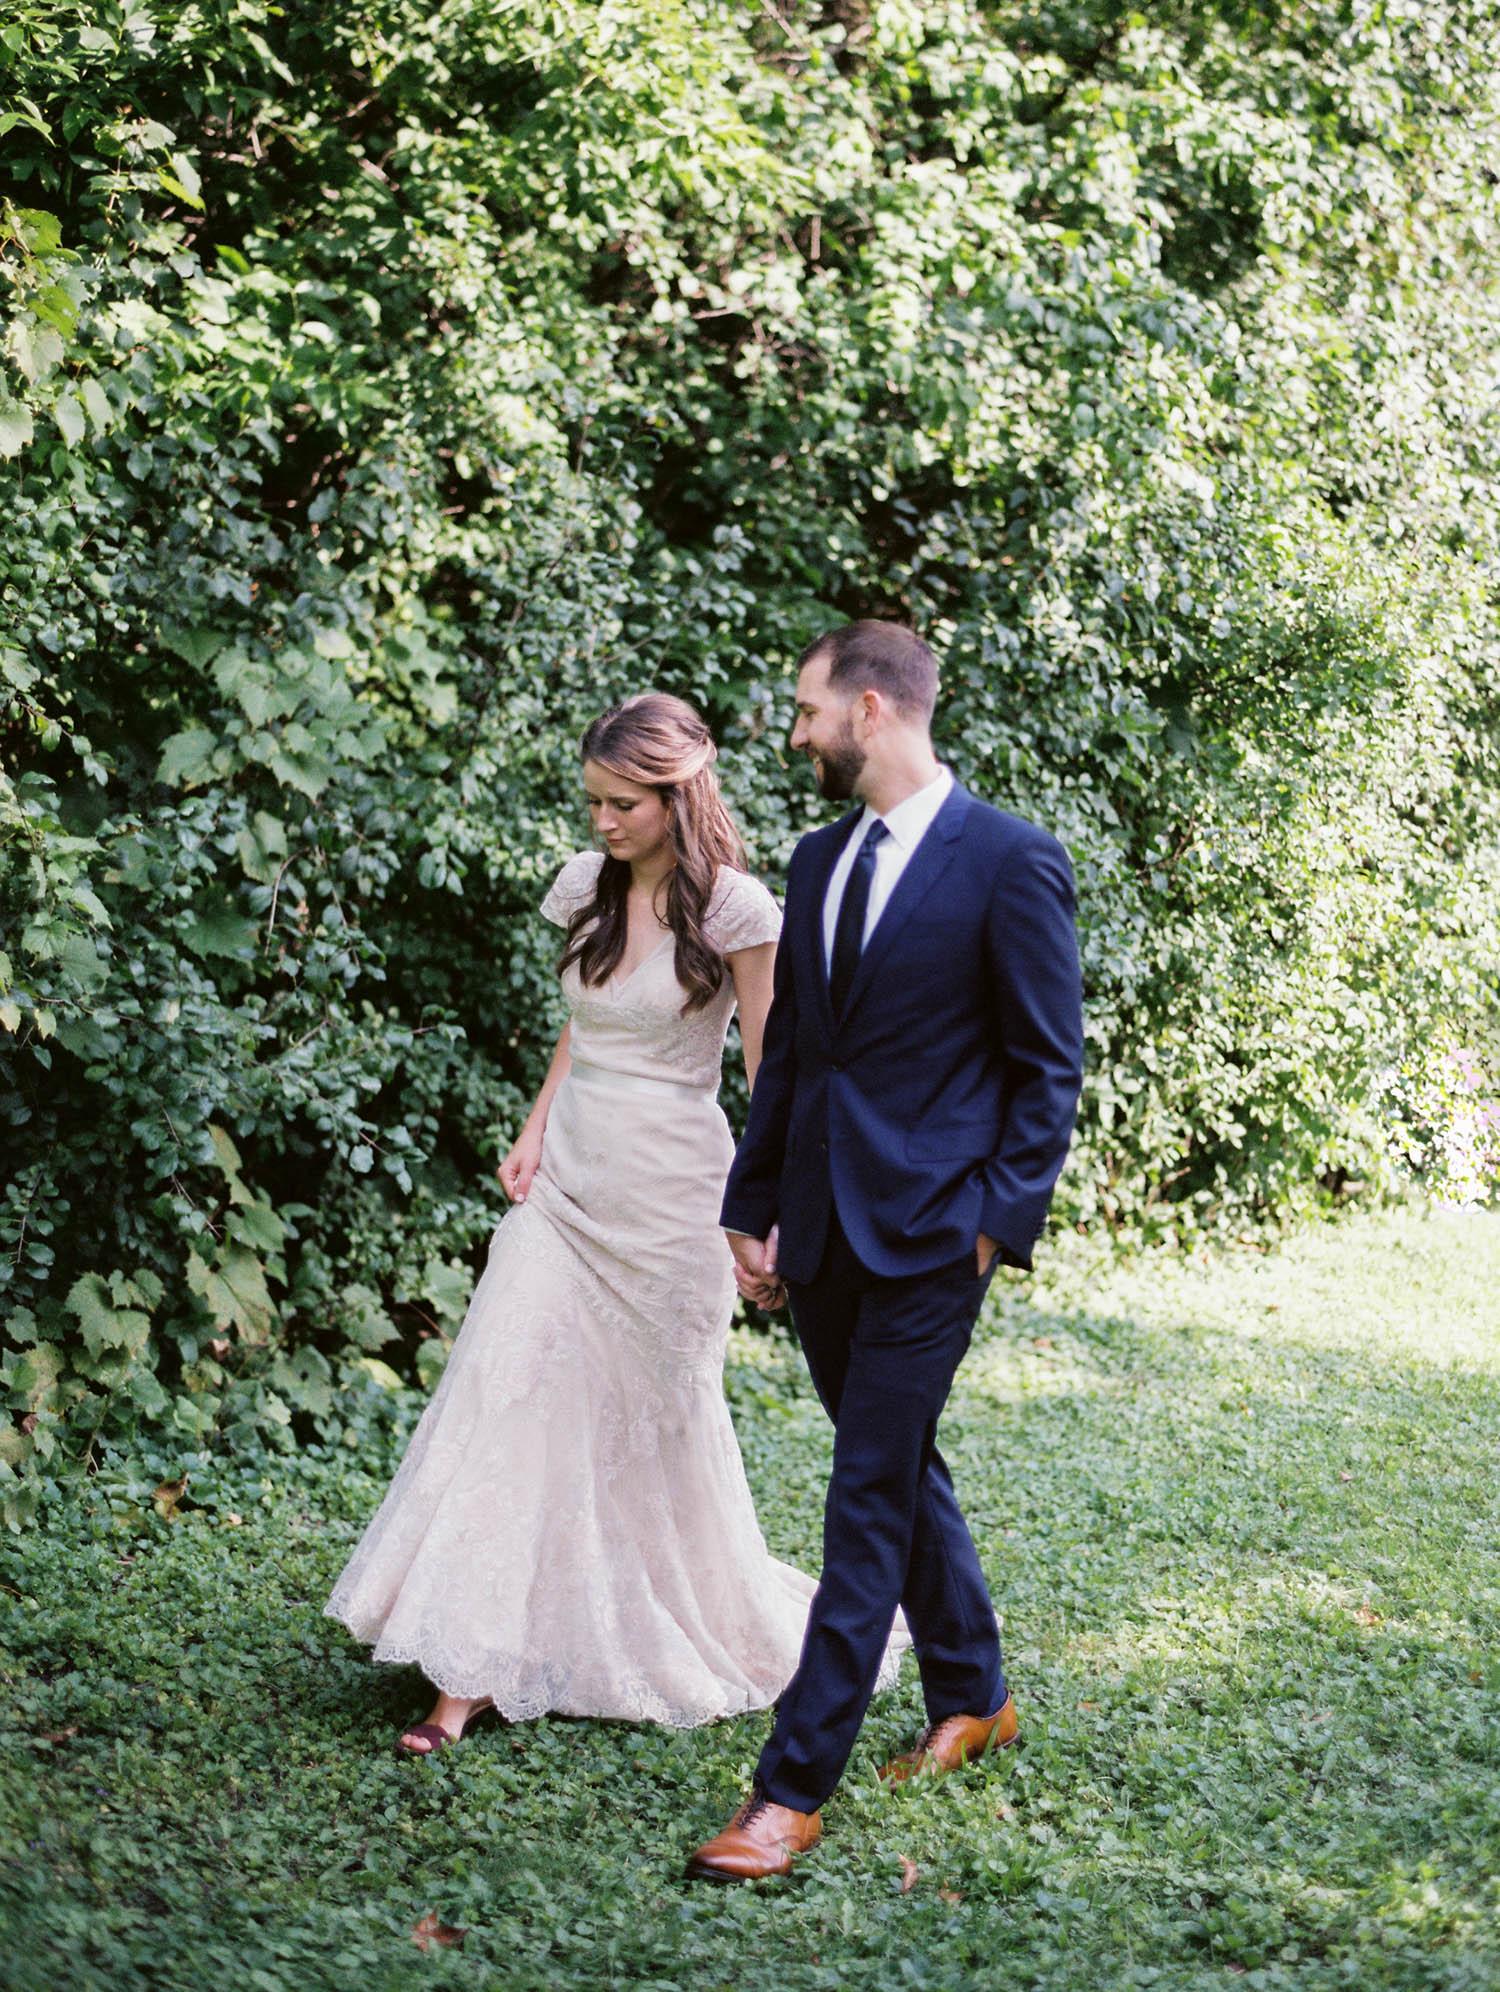 kateweinsteinphoto_milwaukee_wedding_pritzlaff-121.jpg